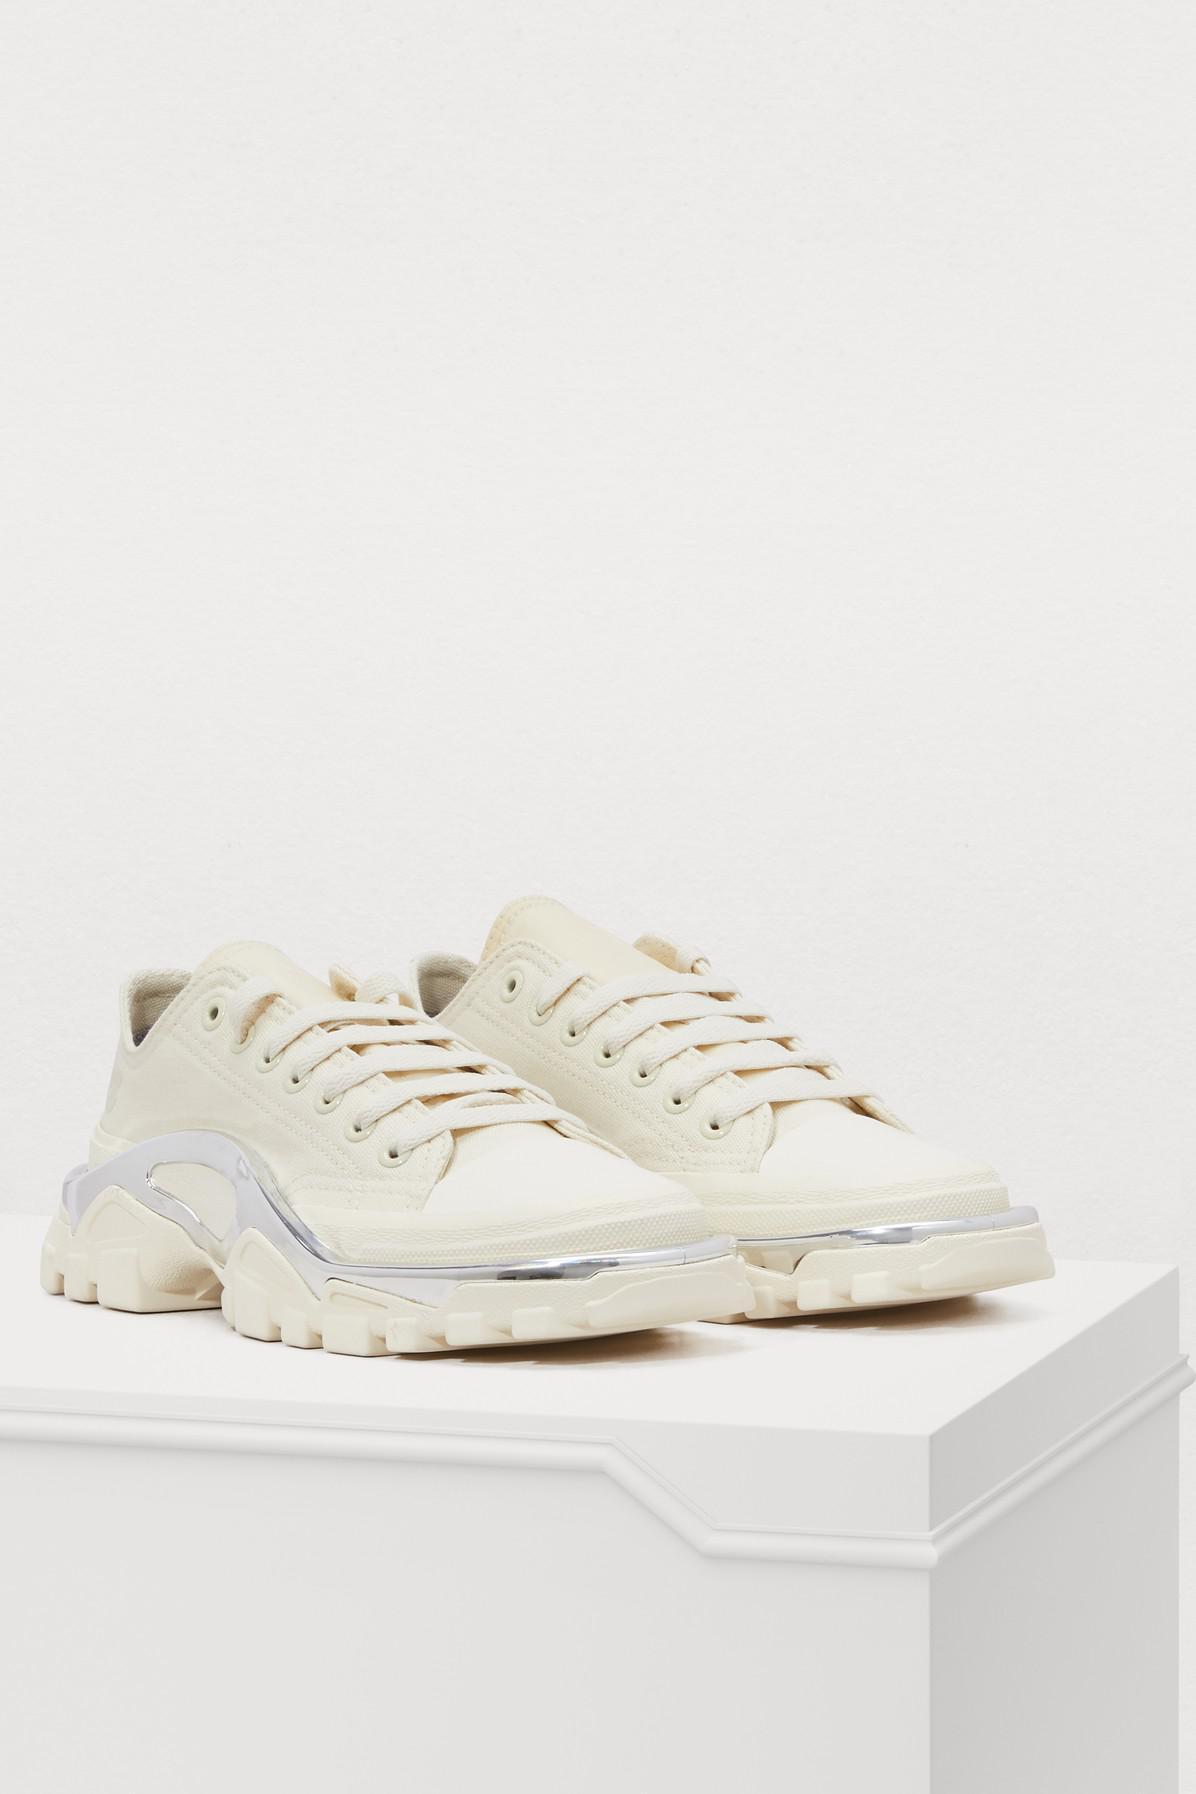 watch 87da3 63908 Adidas By Raf Simons - Multicolor Rs Detroit Runner Sneakers - Lyst. View  fullscreen